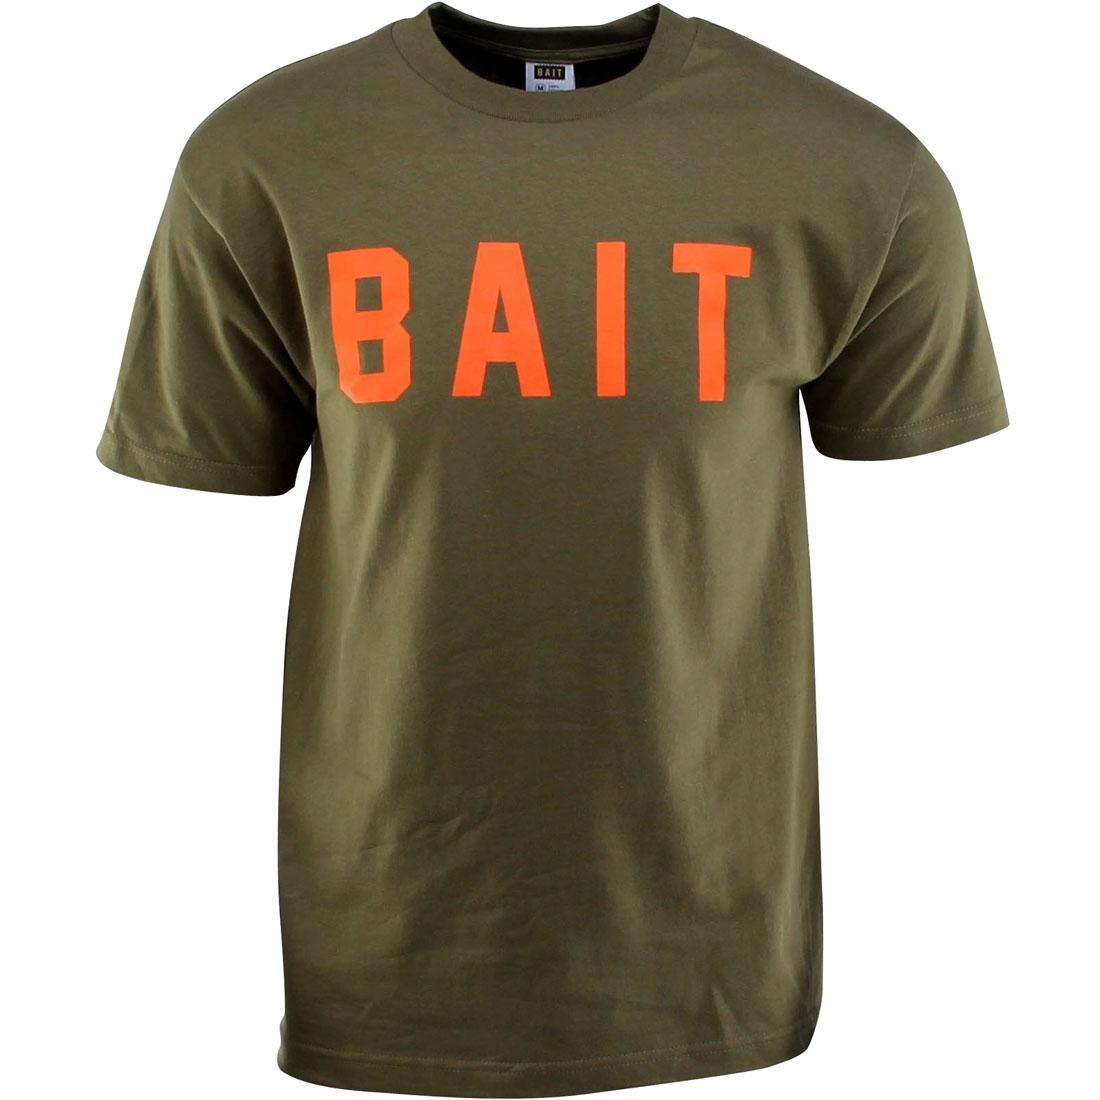 BAIT Logo Tee (green / military green / orange)